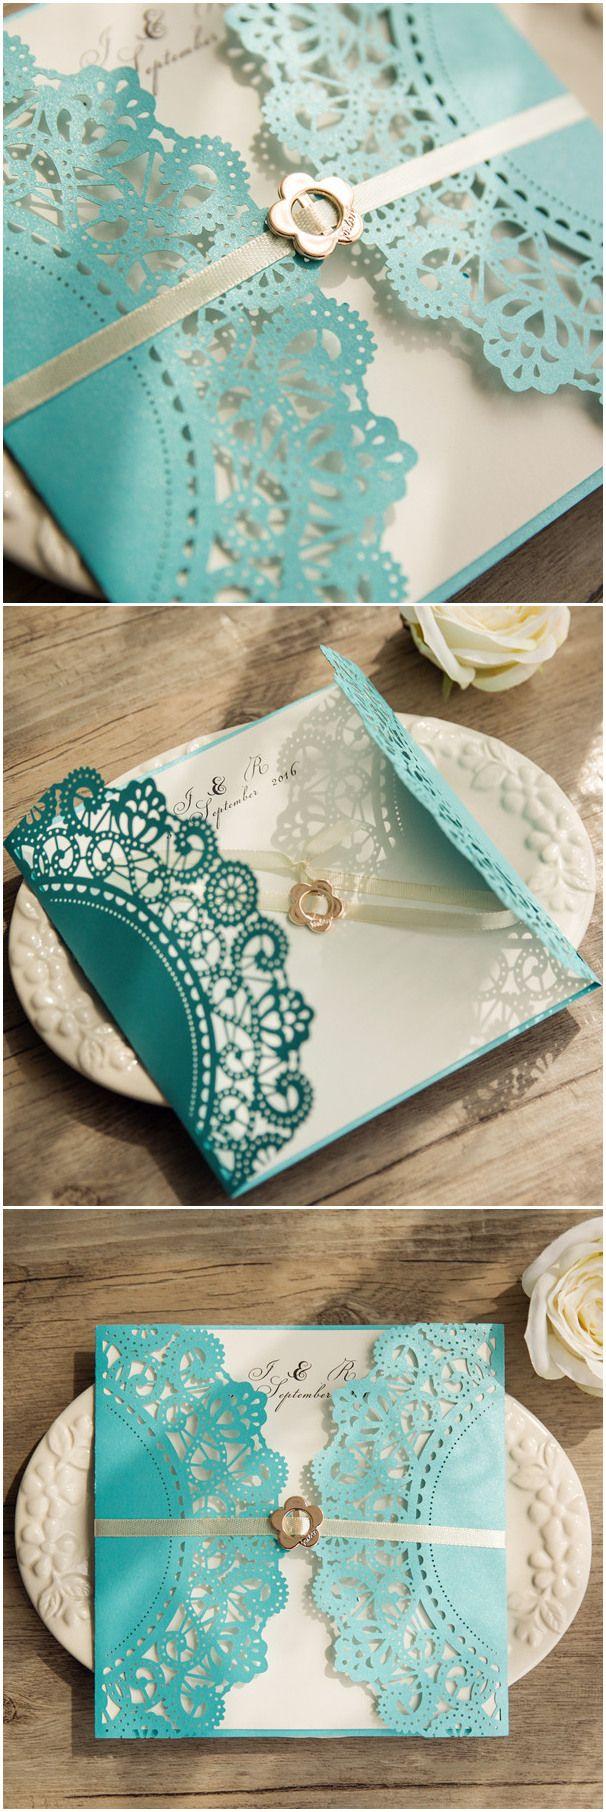 Tiffany blue themed lace design laser cut wedding invitations ...